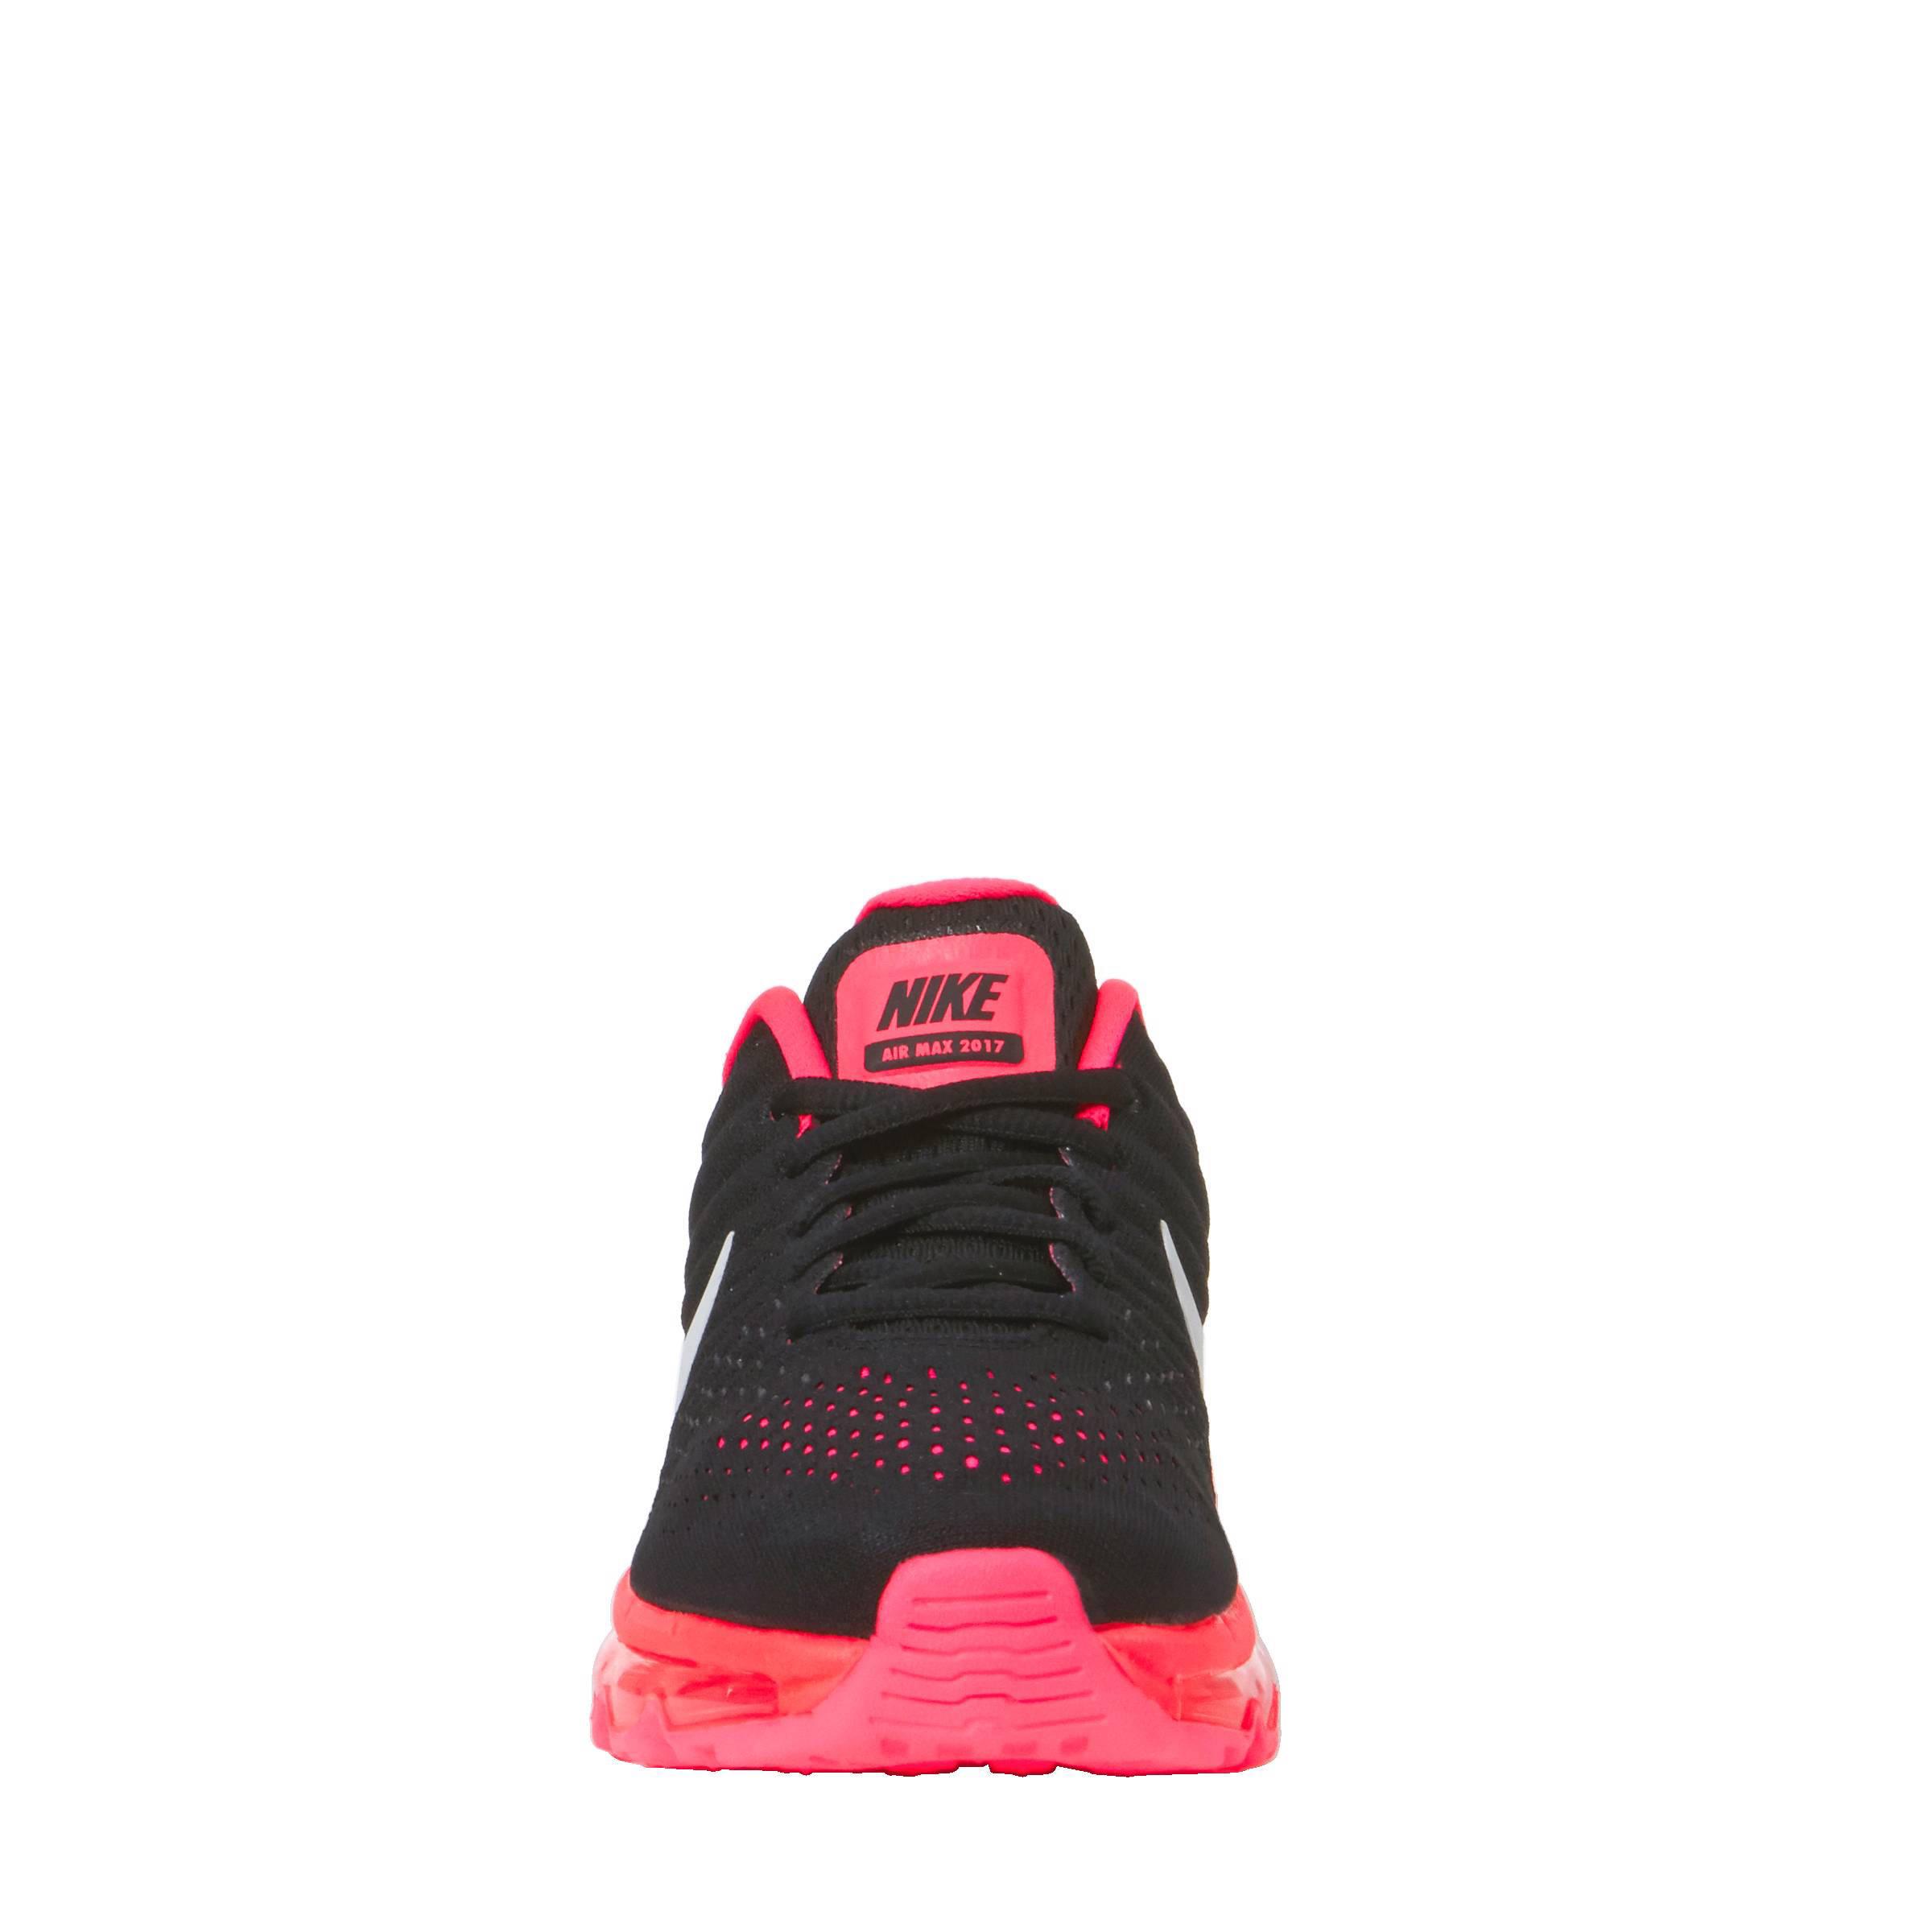 nike air max 2017 neon roze